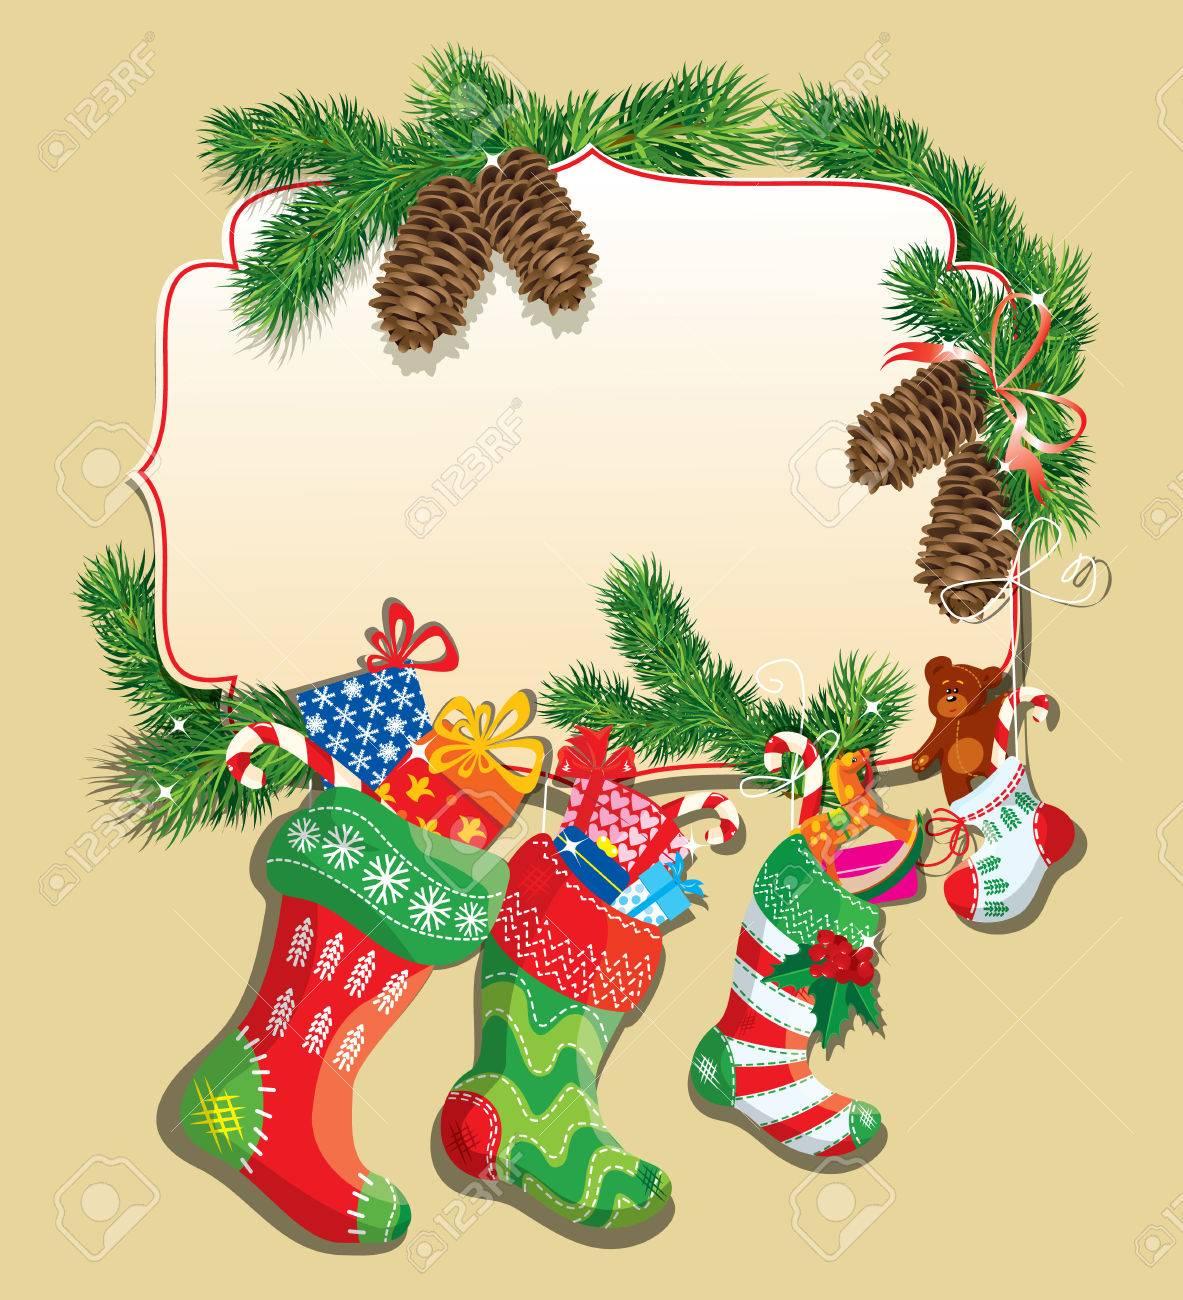 Family Christmas Stockings.X Mas And New Year Card With Family Christmas Stockings Frame